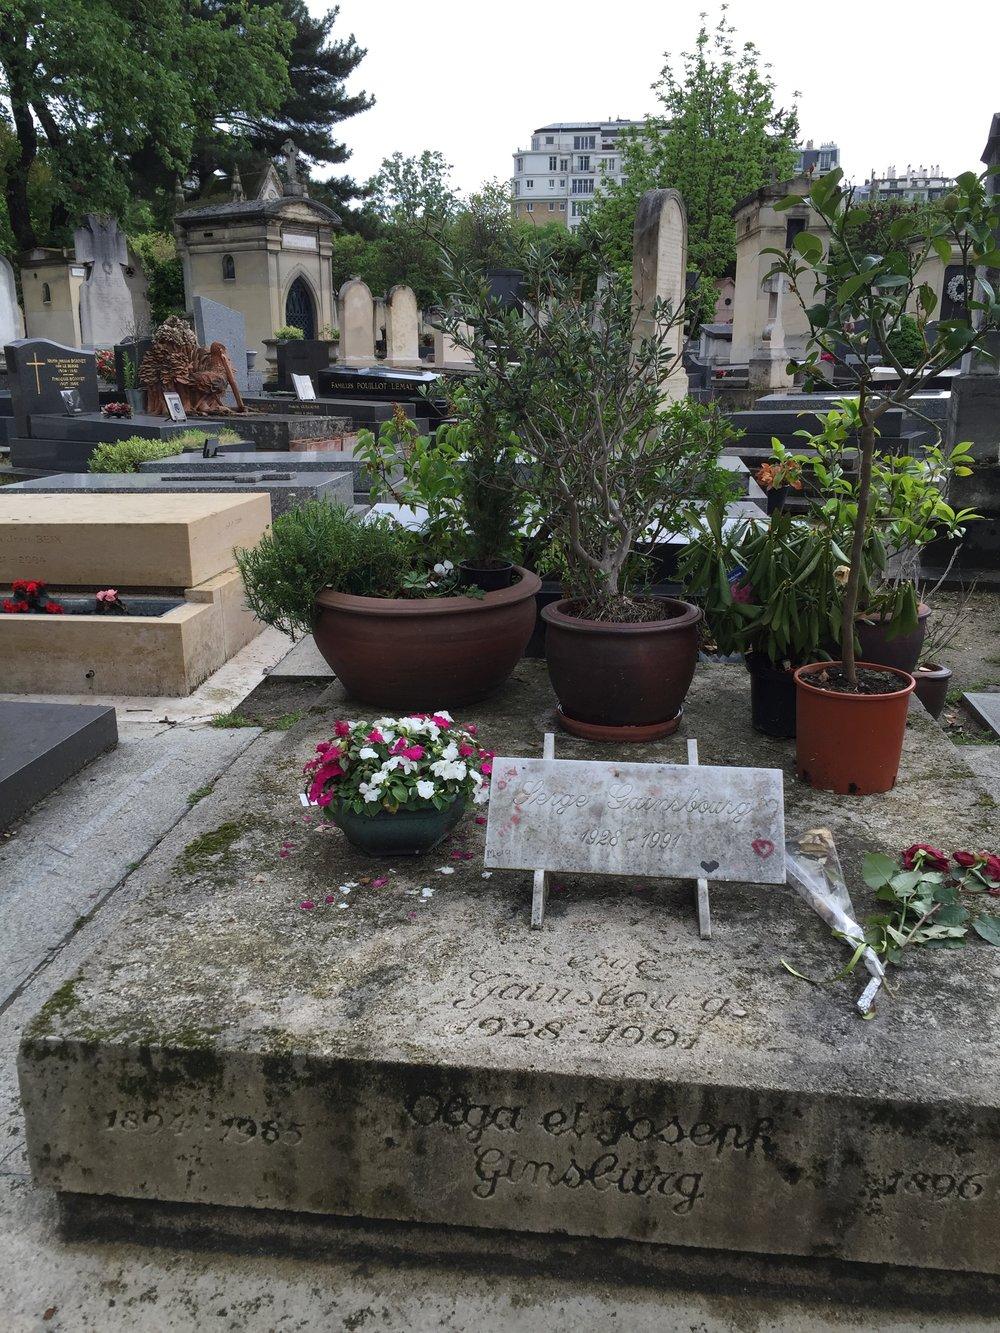 Serge Gainsbourg's grave atMontparnasse Cemetery in Paris